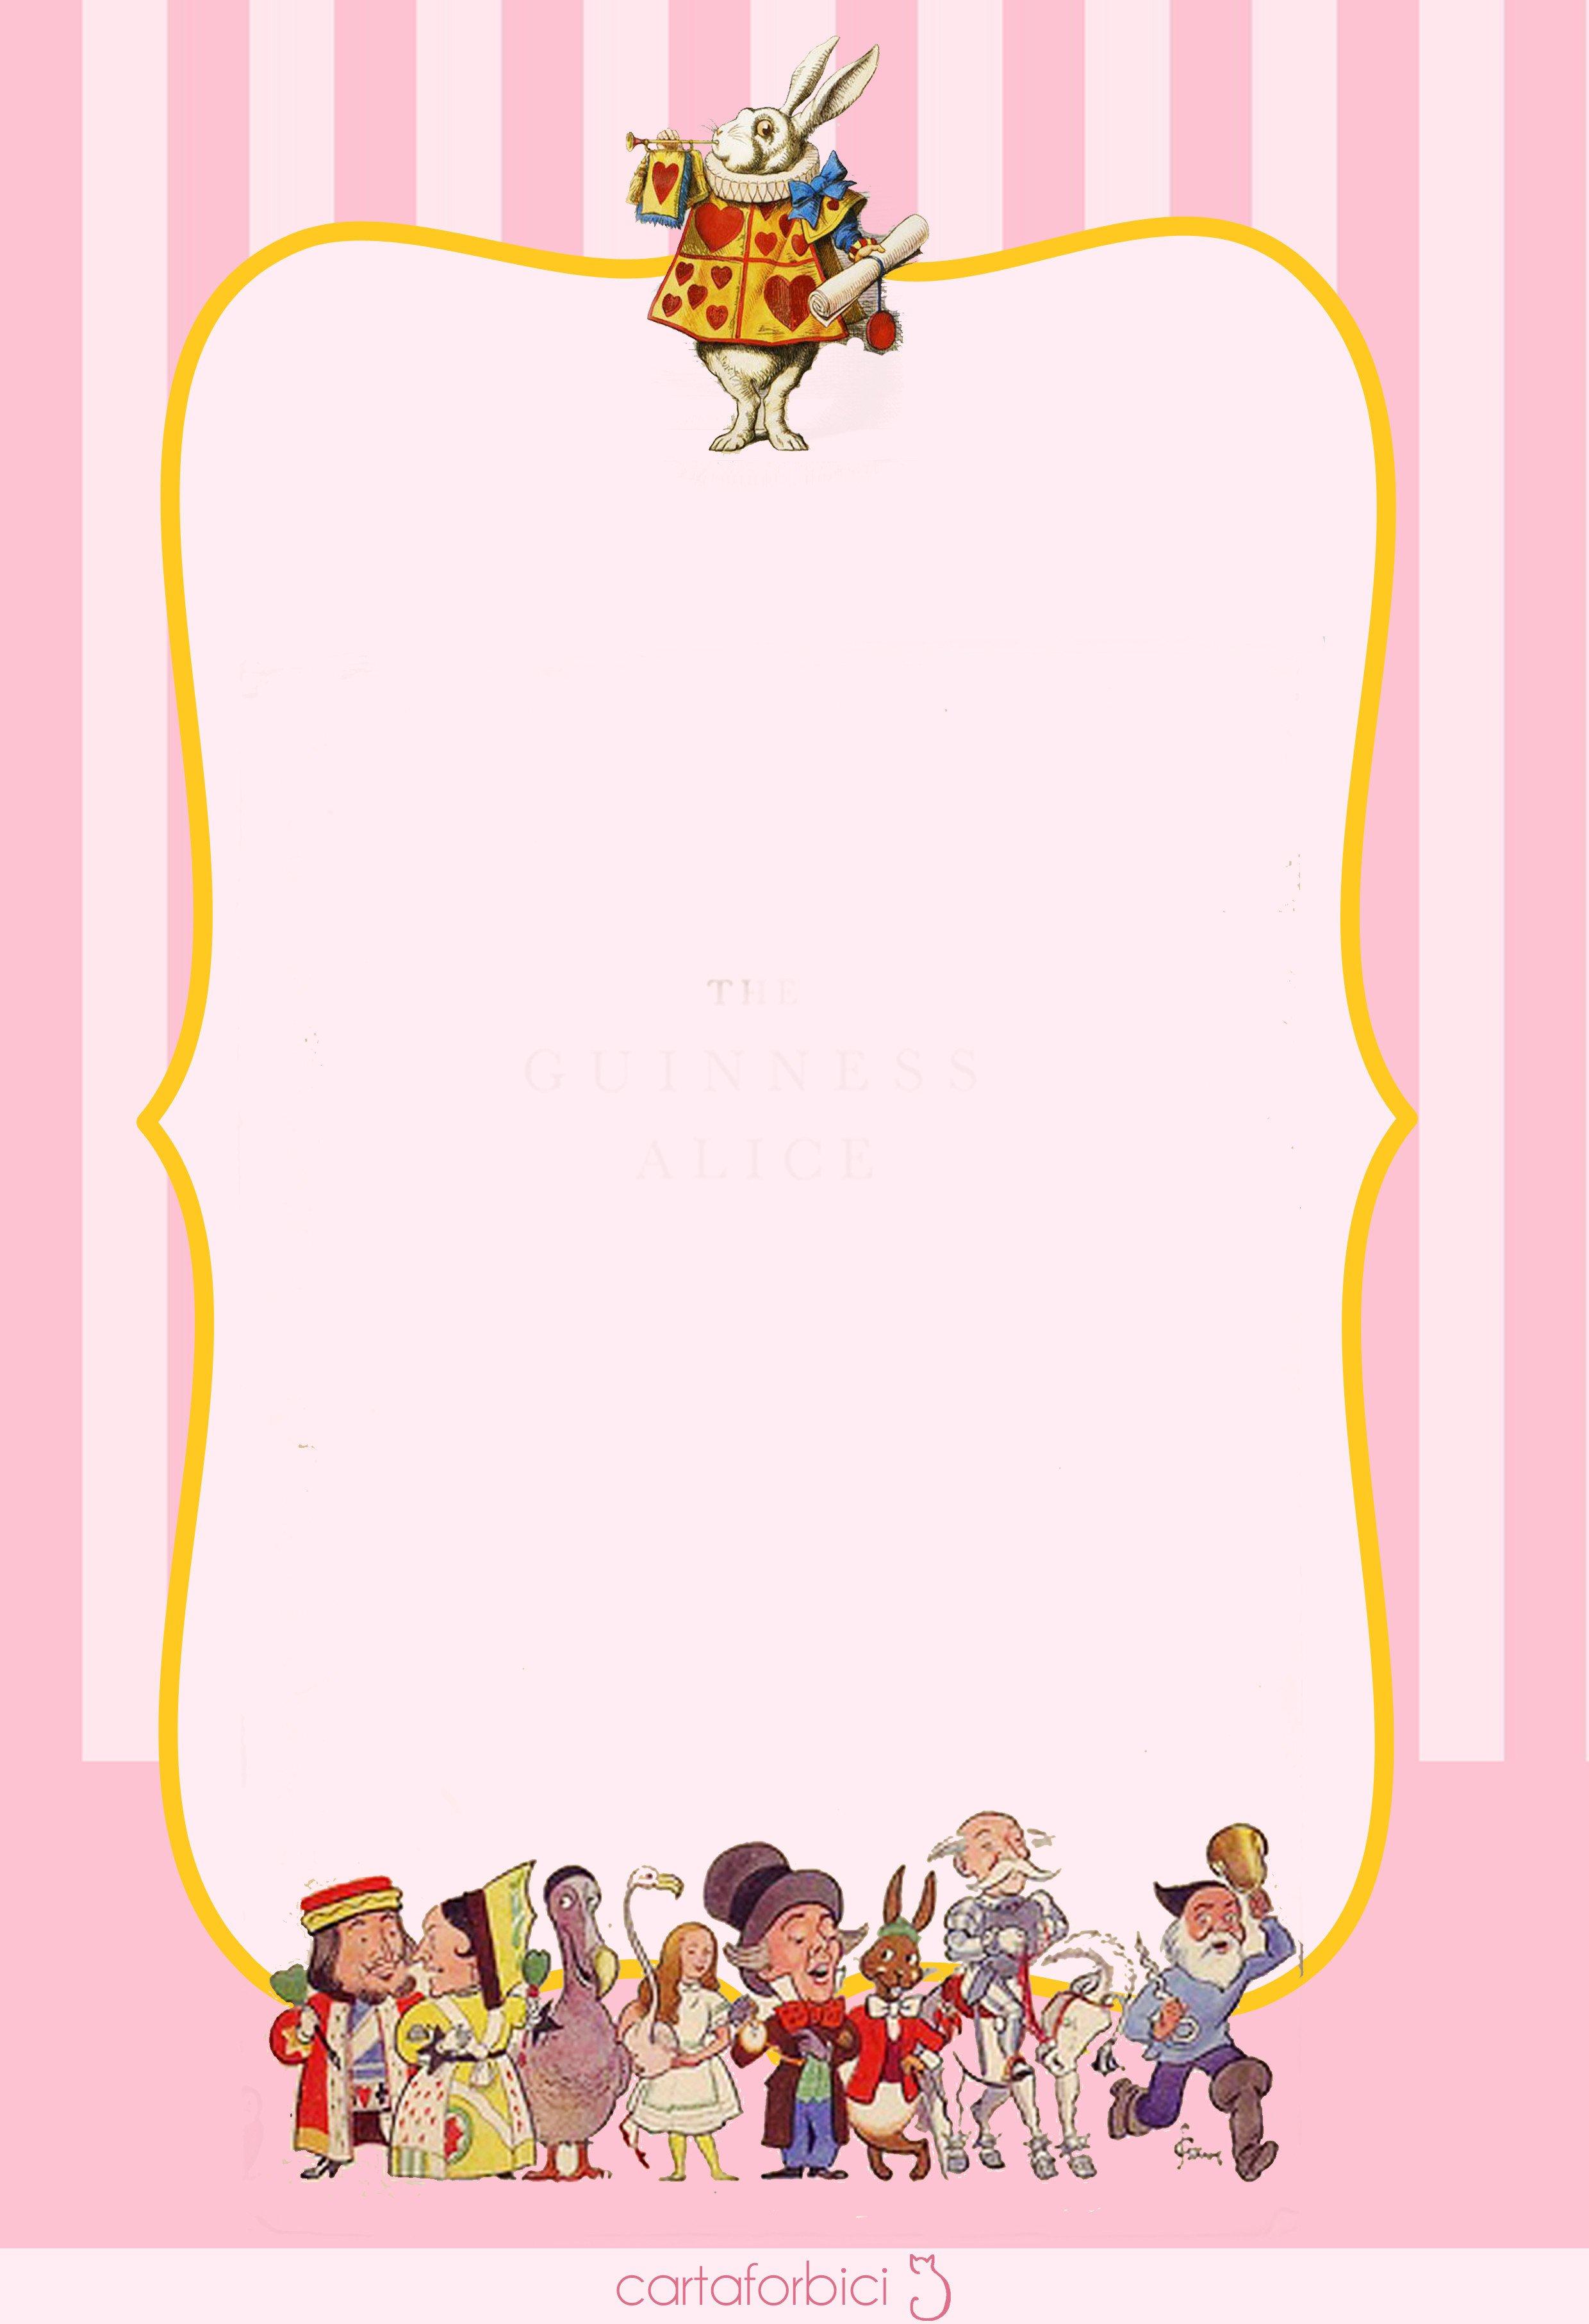 Alice In Wonderland Invitations Templates Alice In Wonderland Birthday Invitations – Free Printable